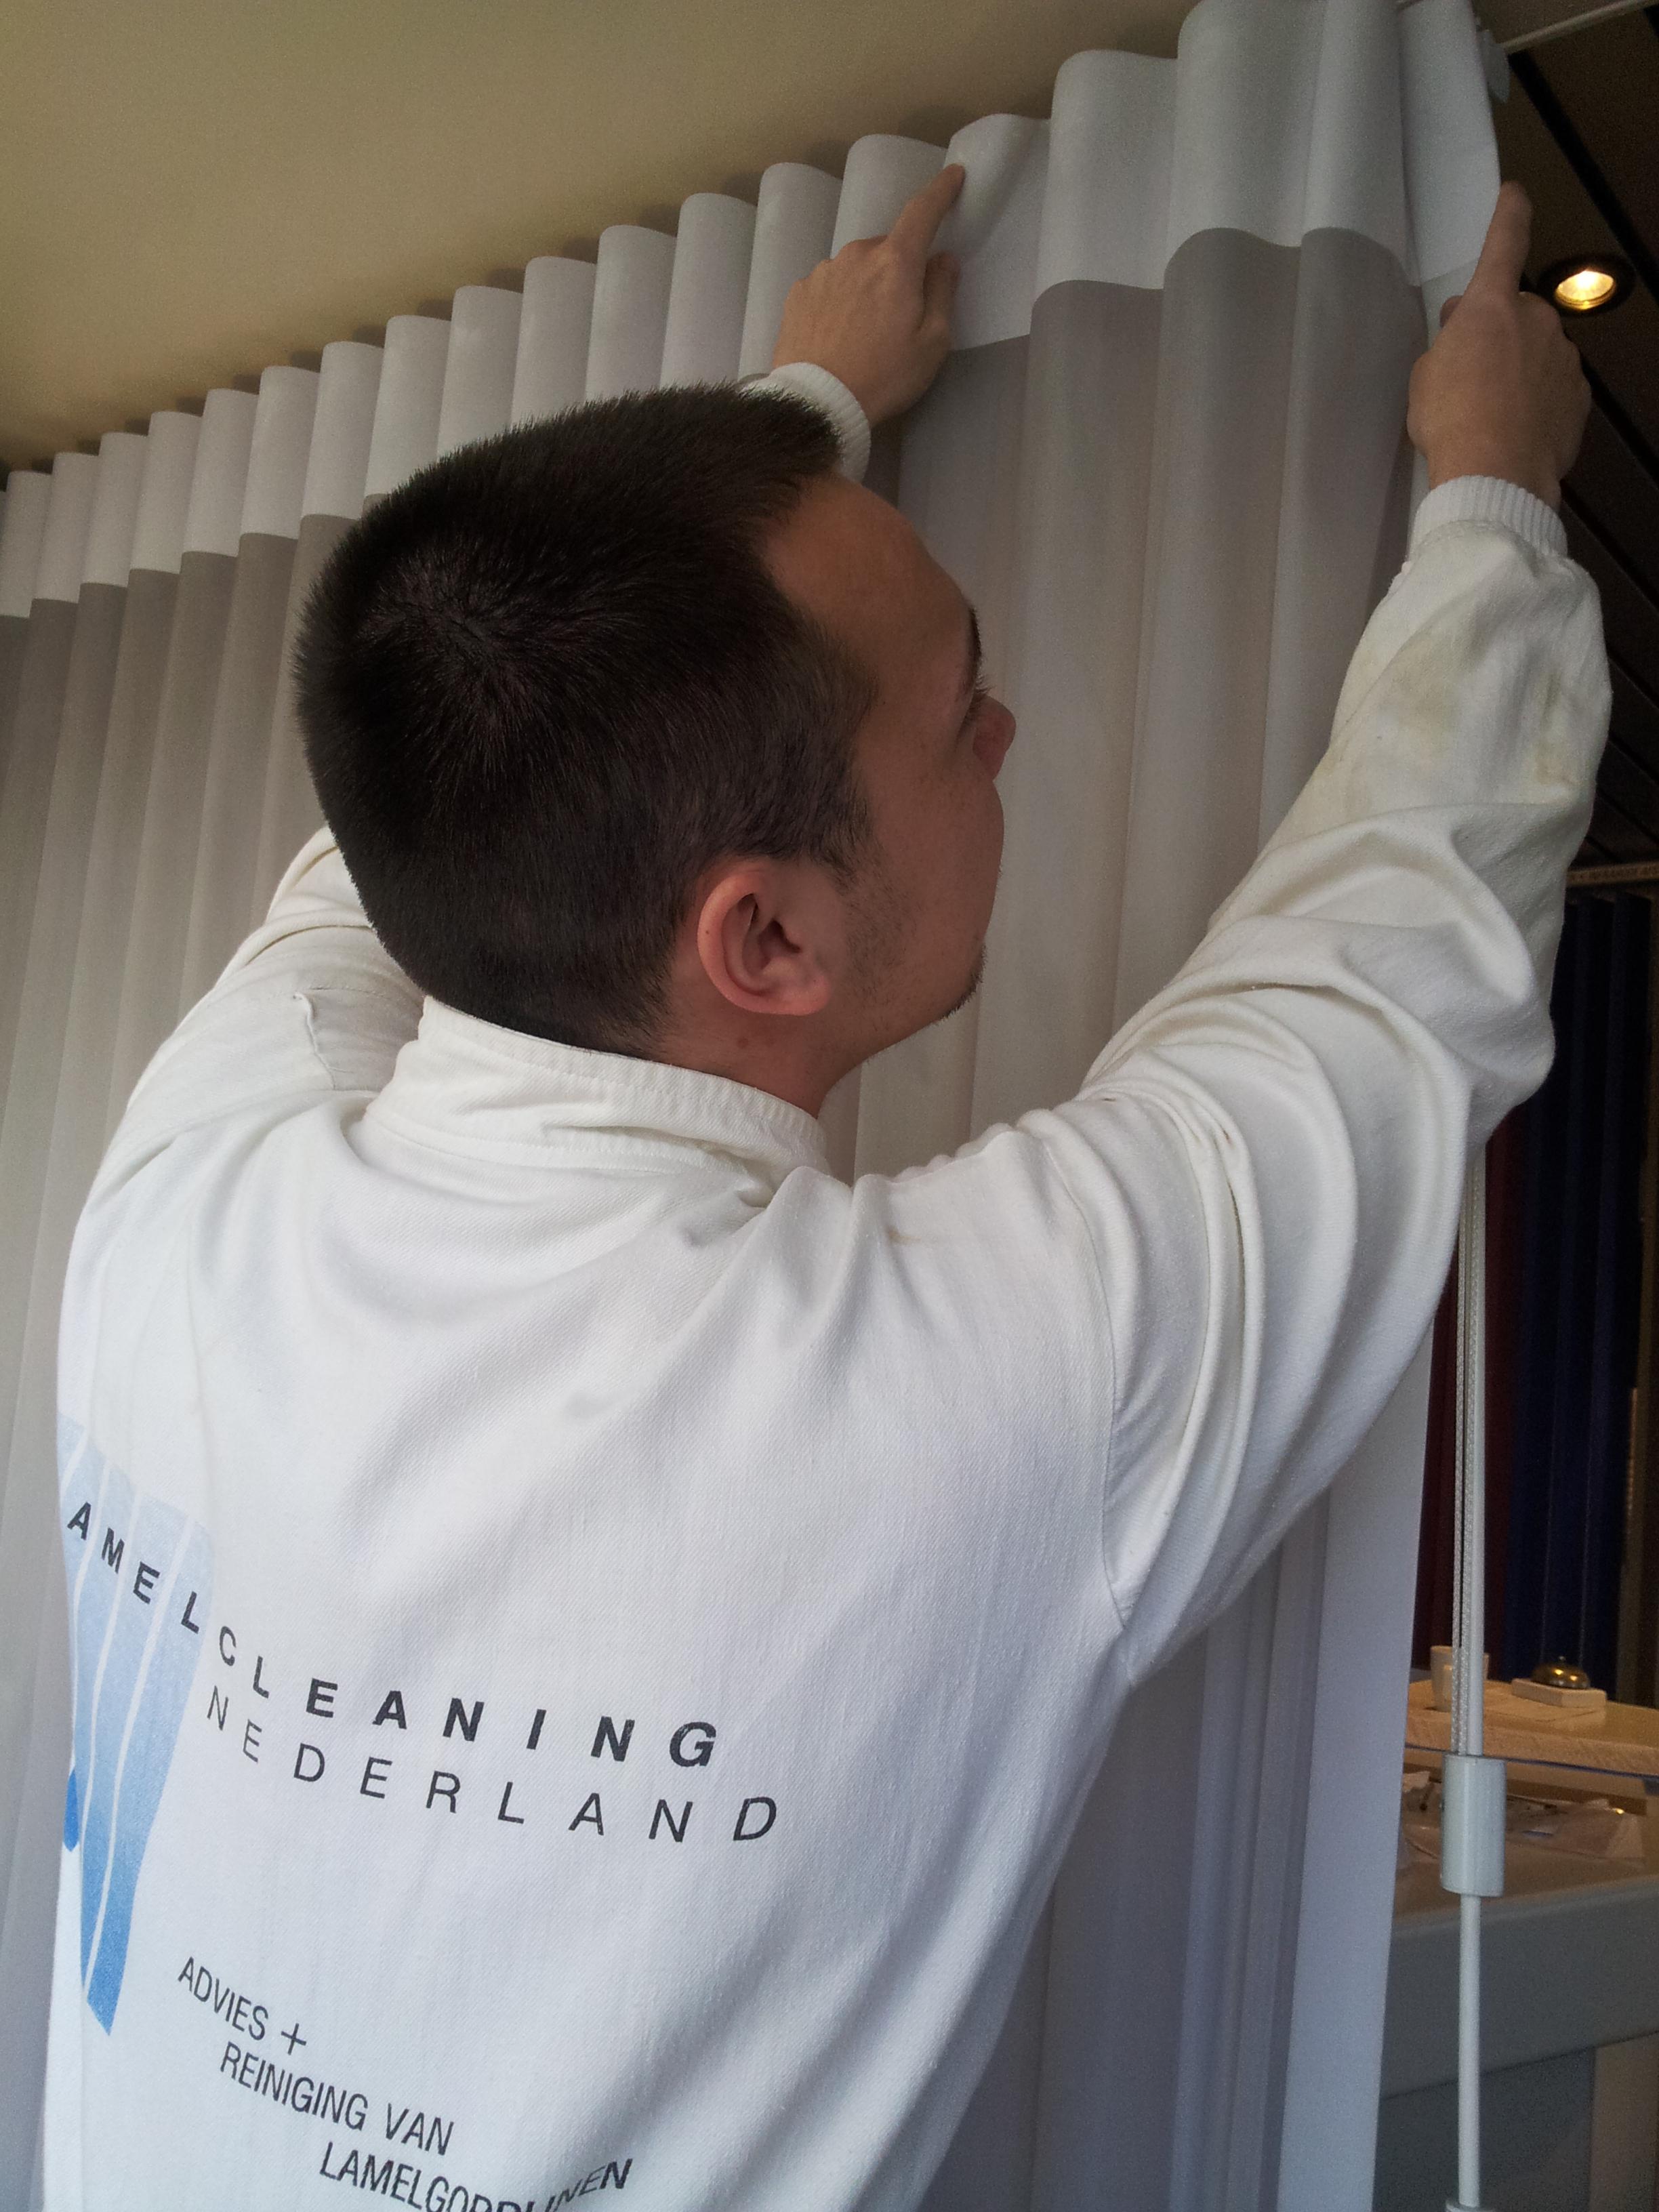 Lamelcleaning Nederland u00ae tel 070 3614361, in  u00e9 u00e9n middag klaar, schoonmaken, repareren,luxaflex